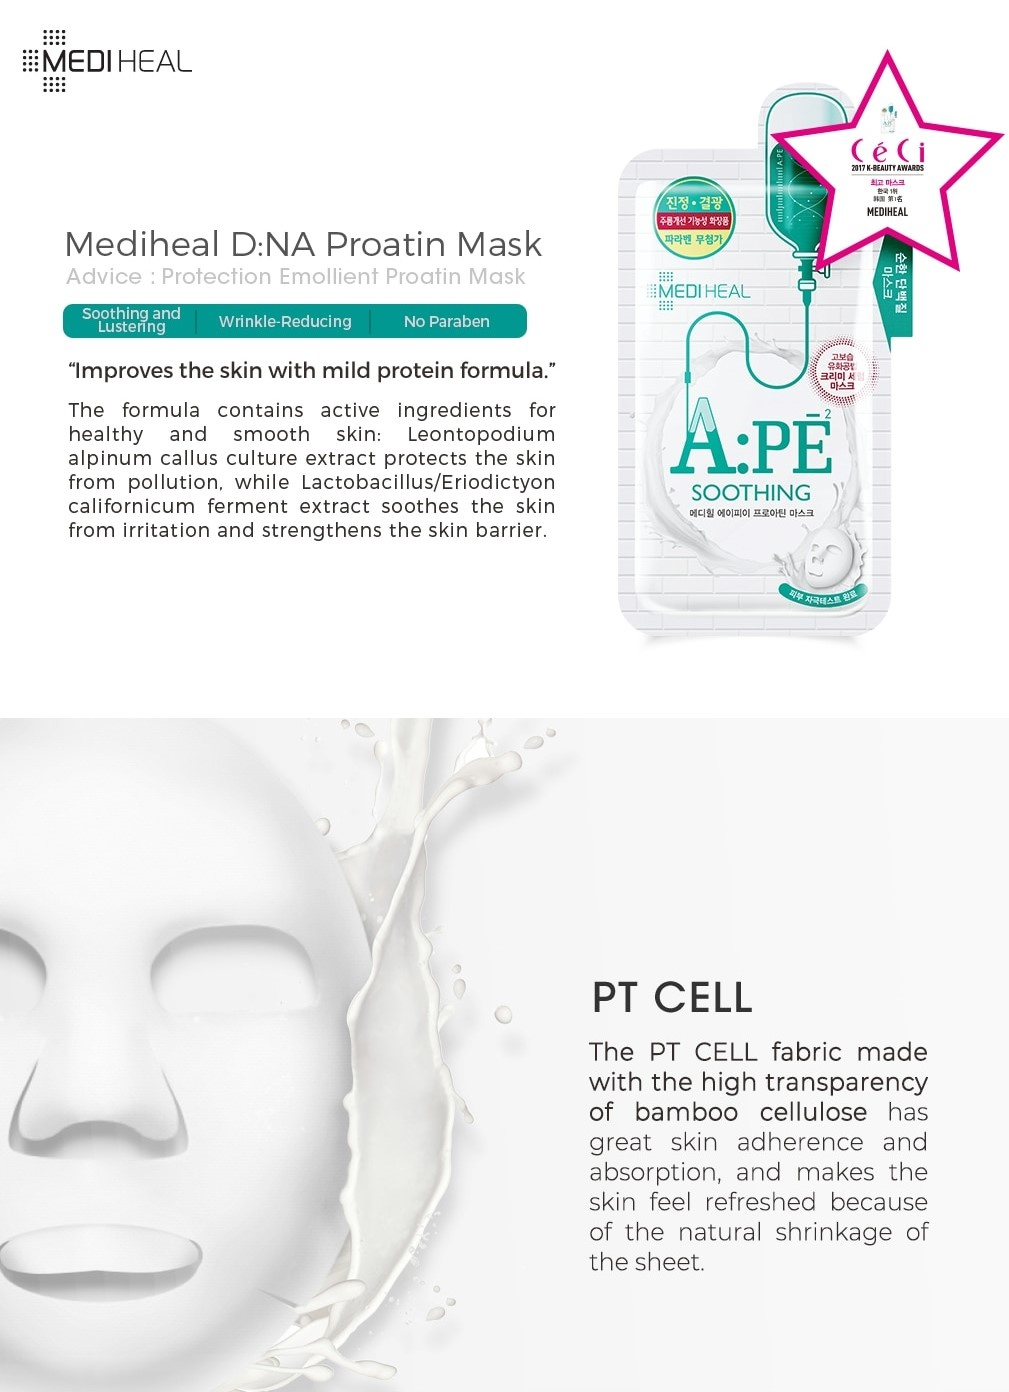 Proatin Mask A.PE Soothing-3